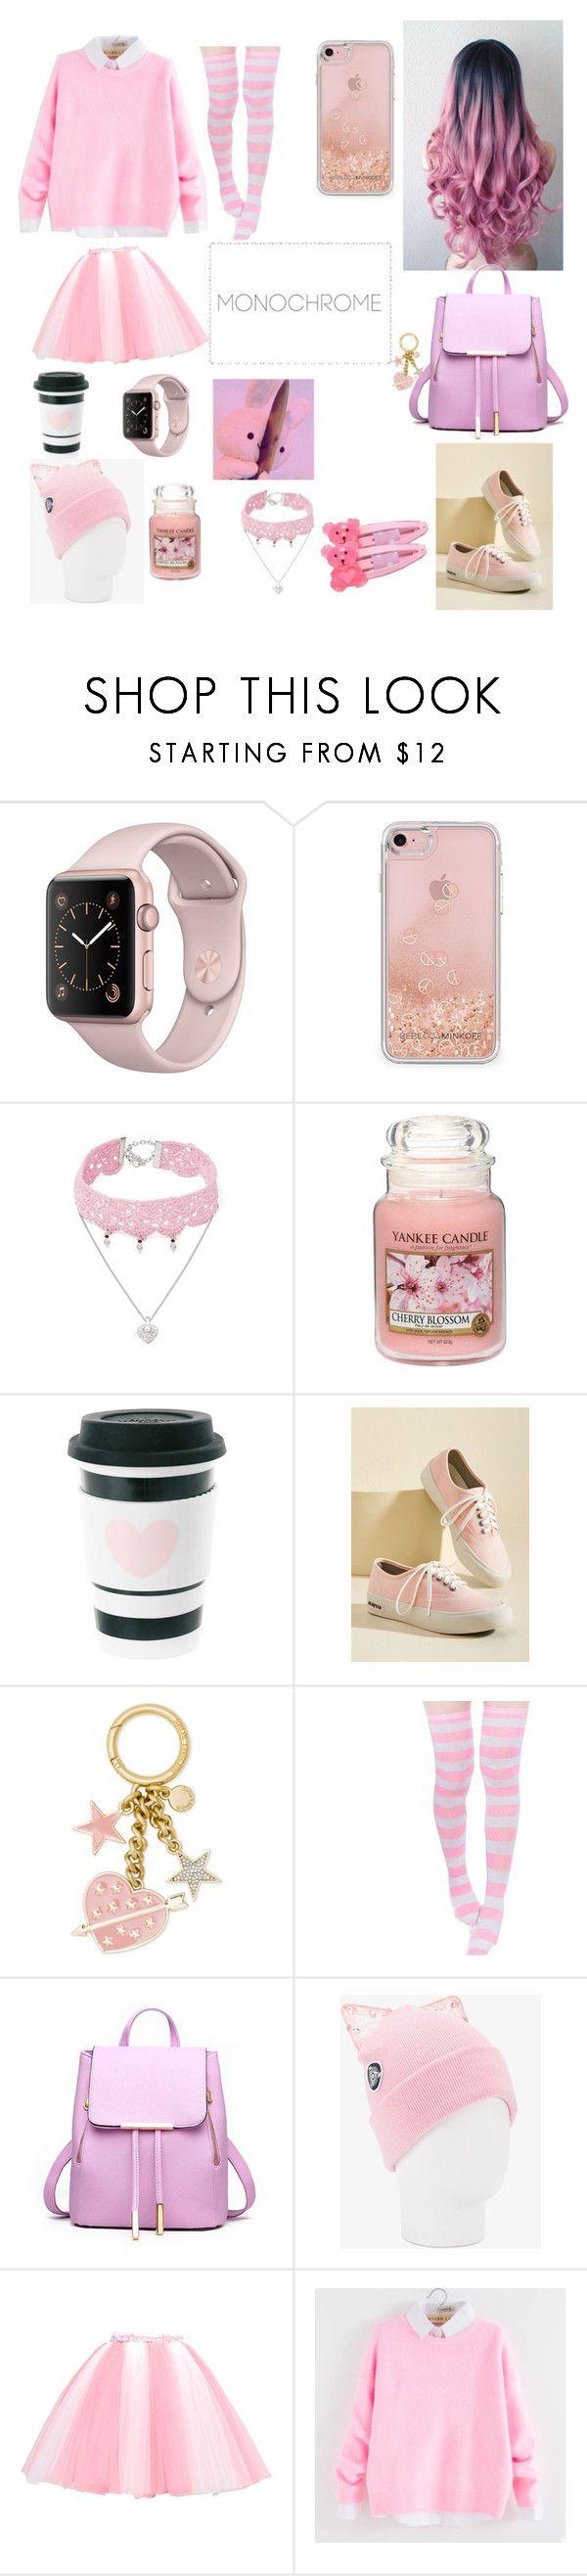 """Cutesy Pink"" by tekutokiariku230 ❤ liked on Polyvore featuring Rebecca Minkoff, Design Lab, Yankee Candle, SeaVees, Michael Kors, miim, Silver Spoon Attire and As Is"